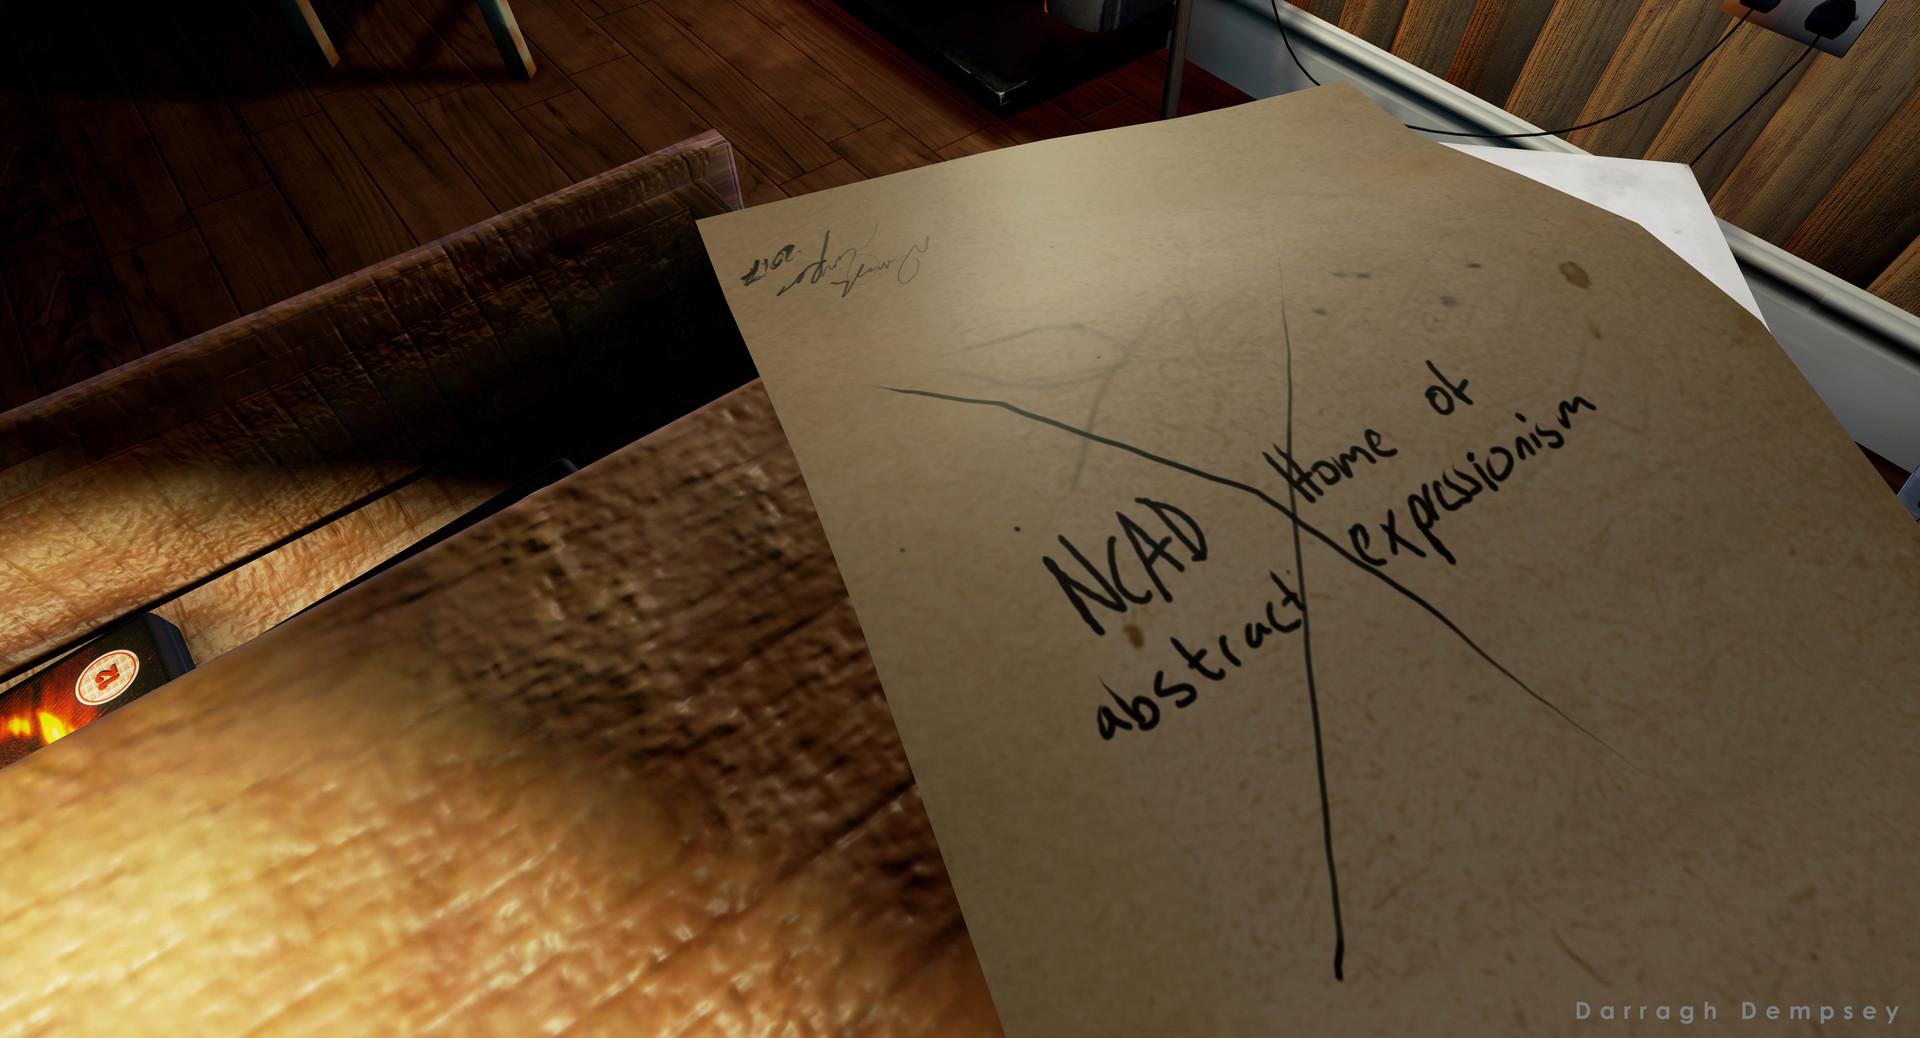 Upside down note easter egg. Unreal Engine Screenshot.